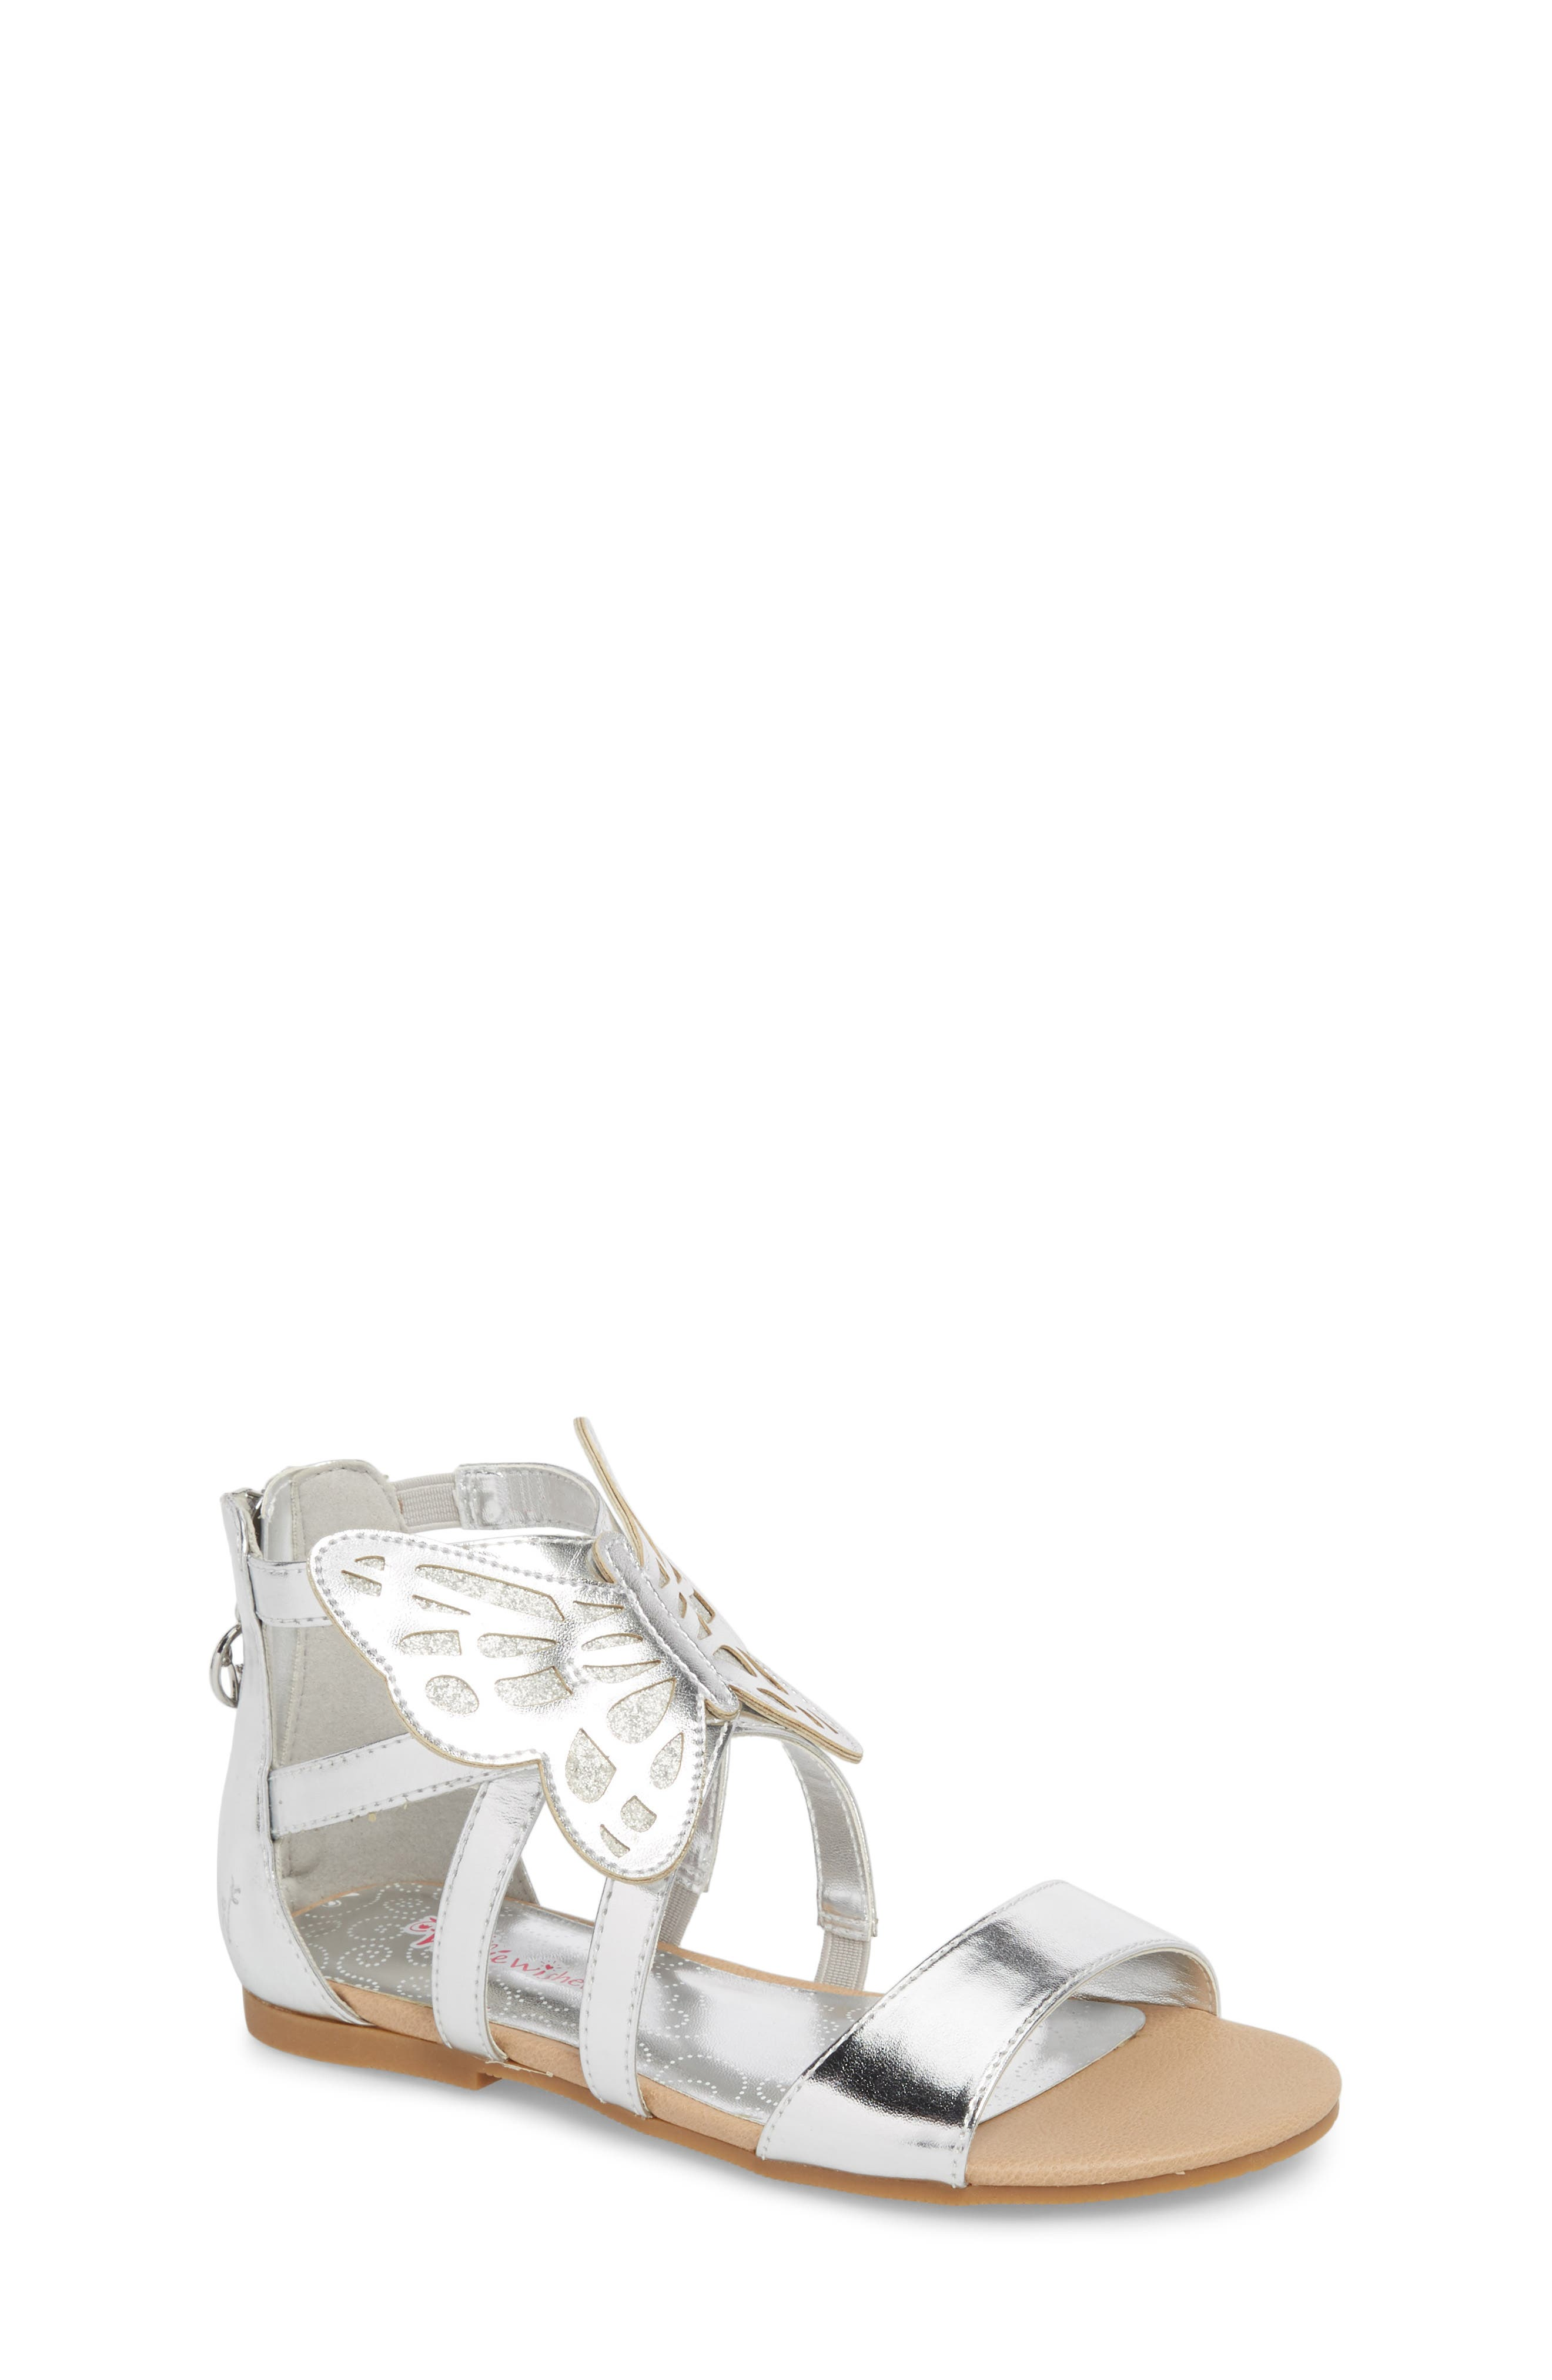 Willa Flutter Metallic Sandal,                             Main thumbnail 1, color,                             046